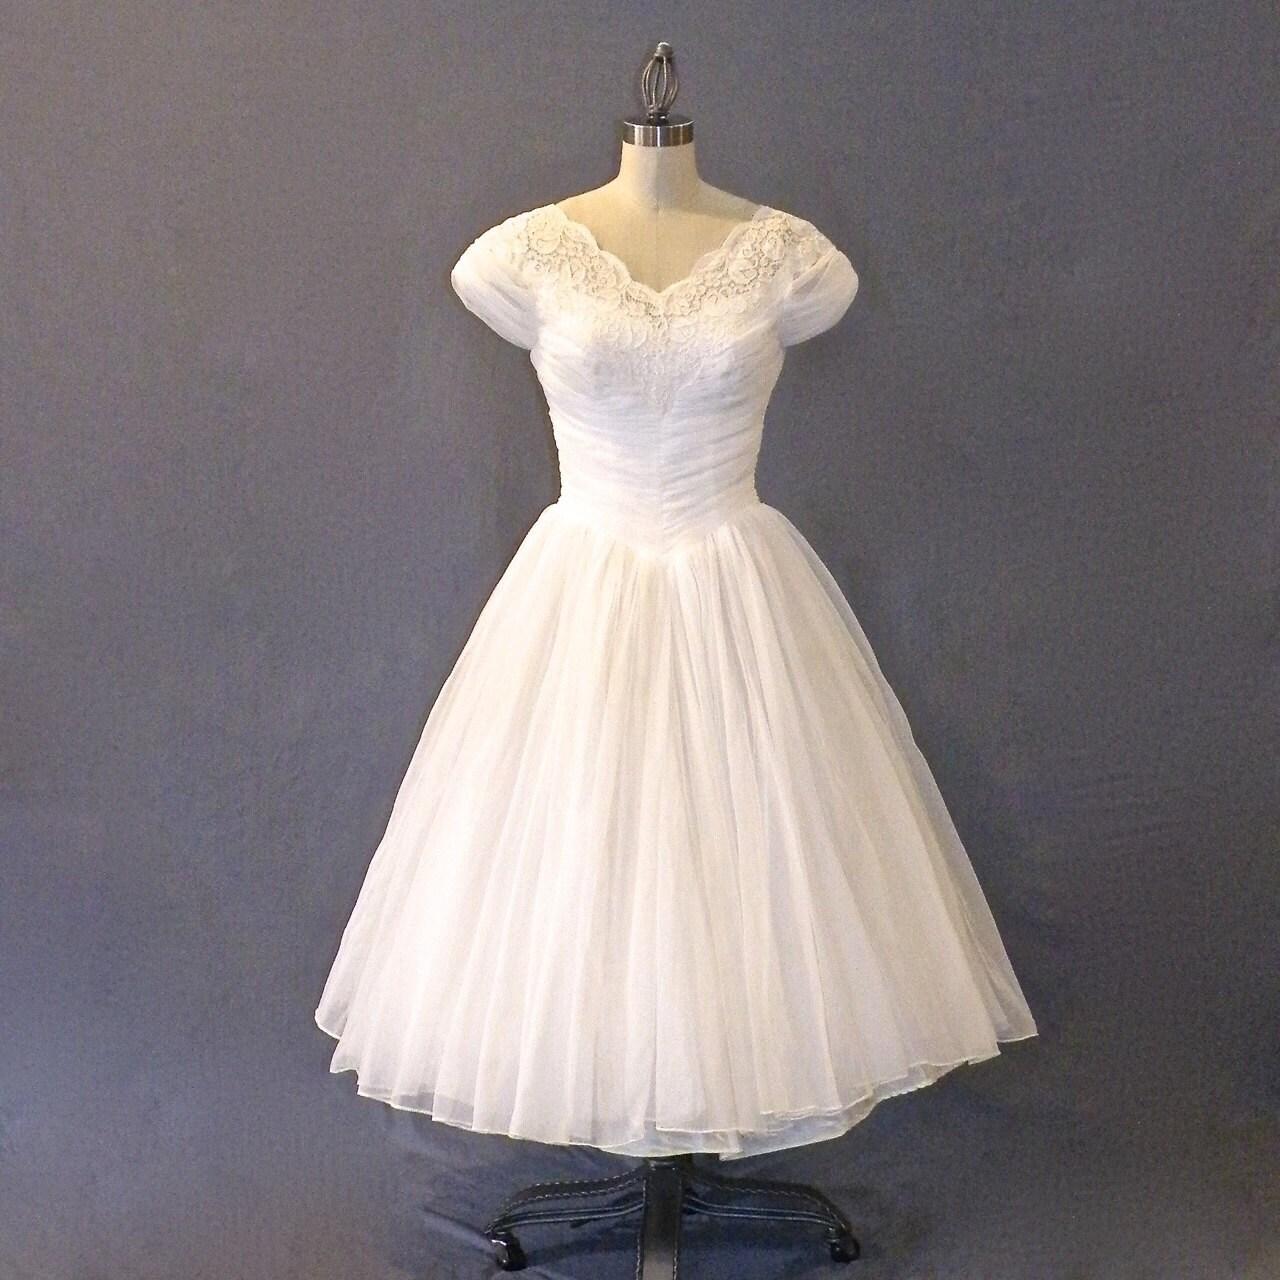 Vintage 1950s Wedding Dress White Chiffon & Lace by